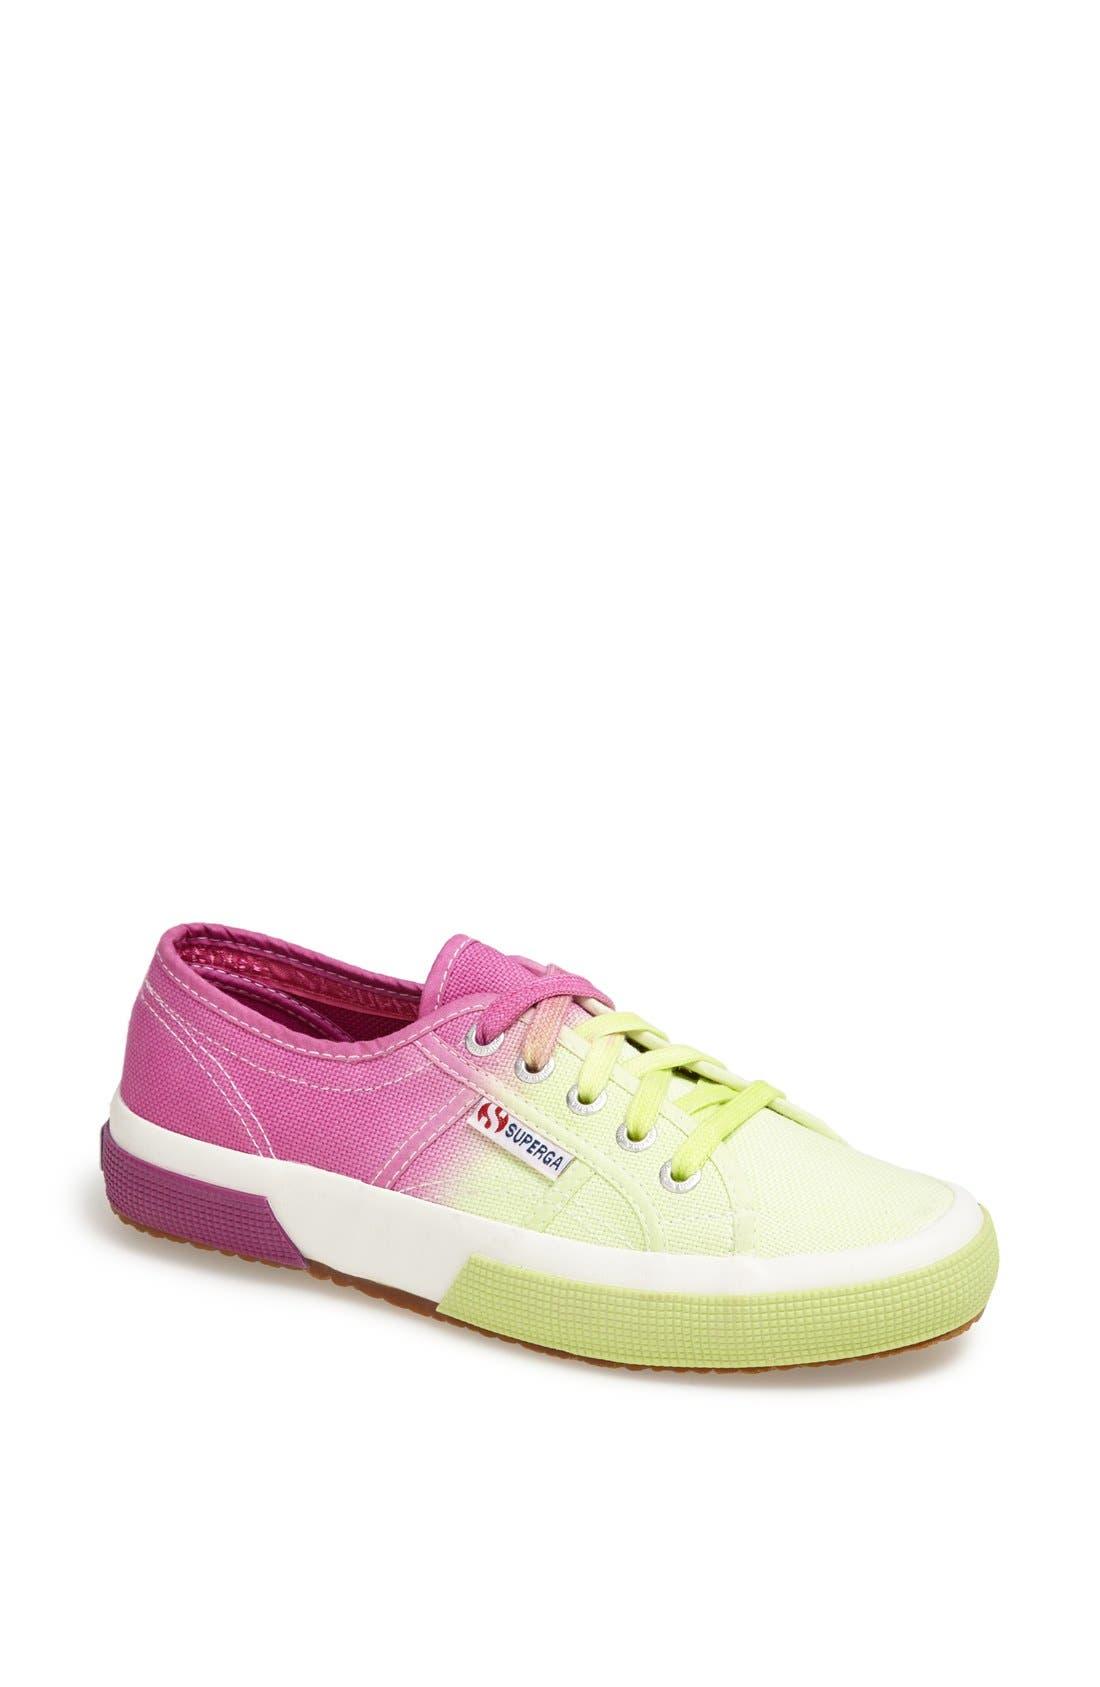 Main Image - Superga 'Cotu - Shade' Sneaker (Women)